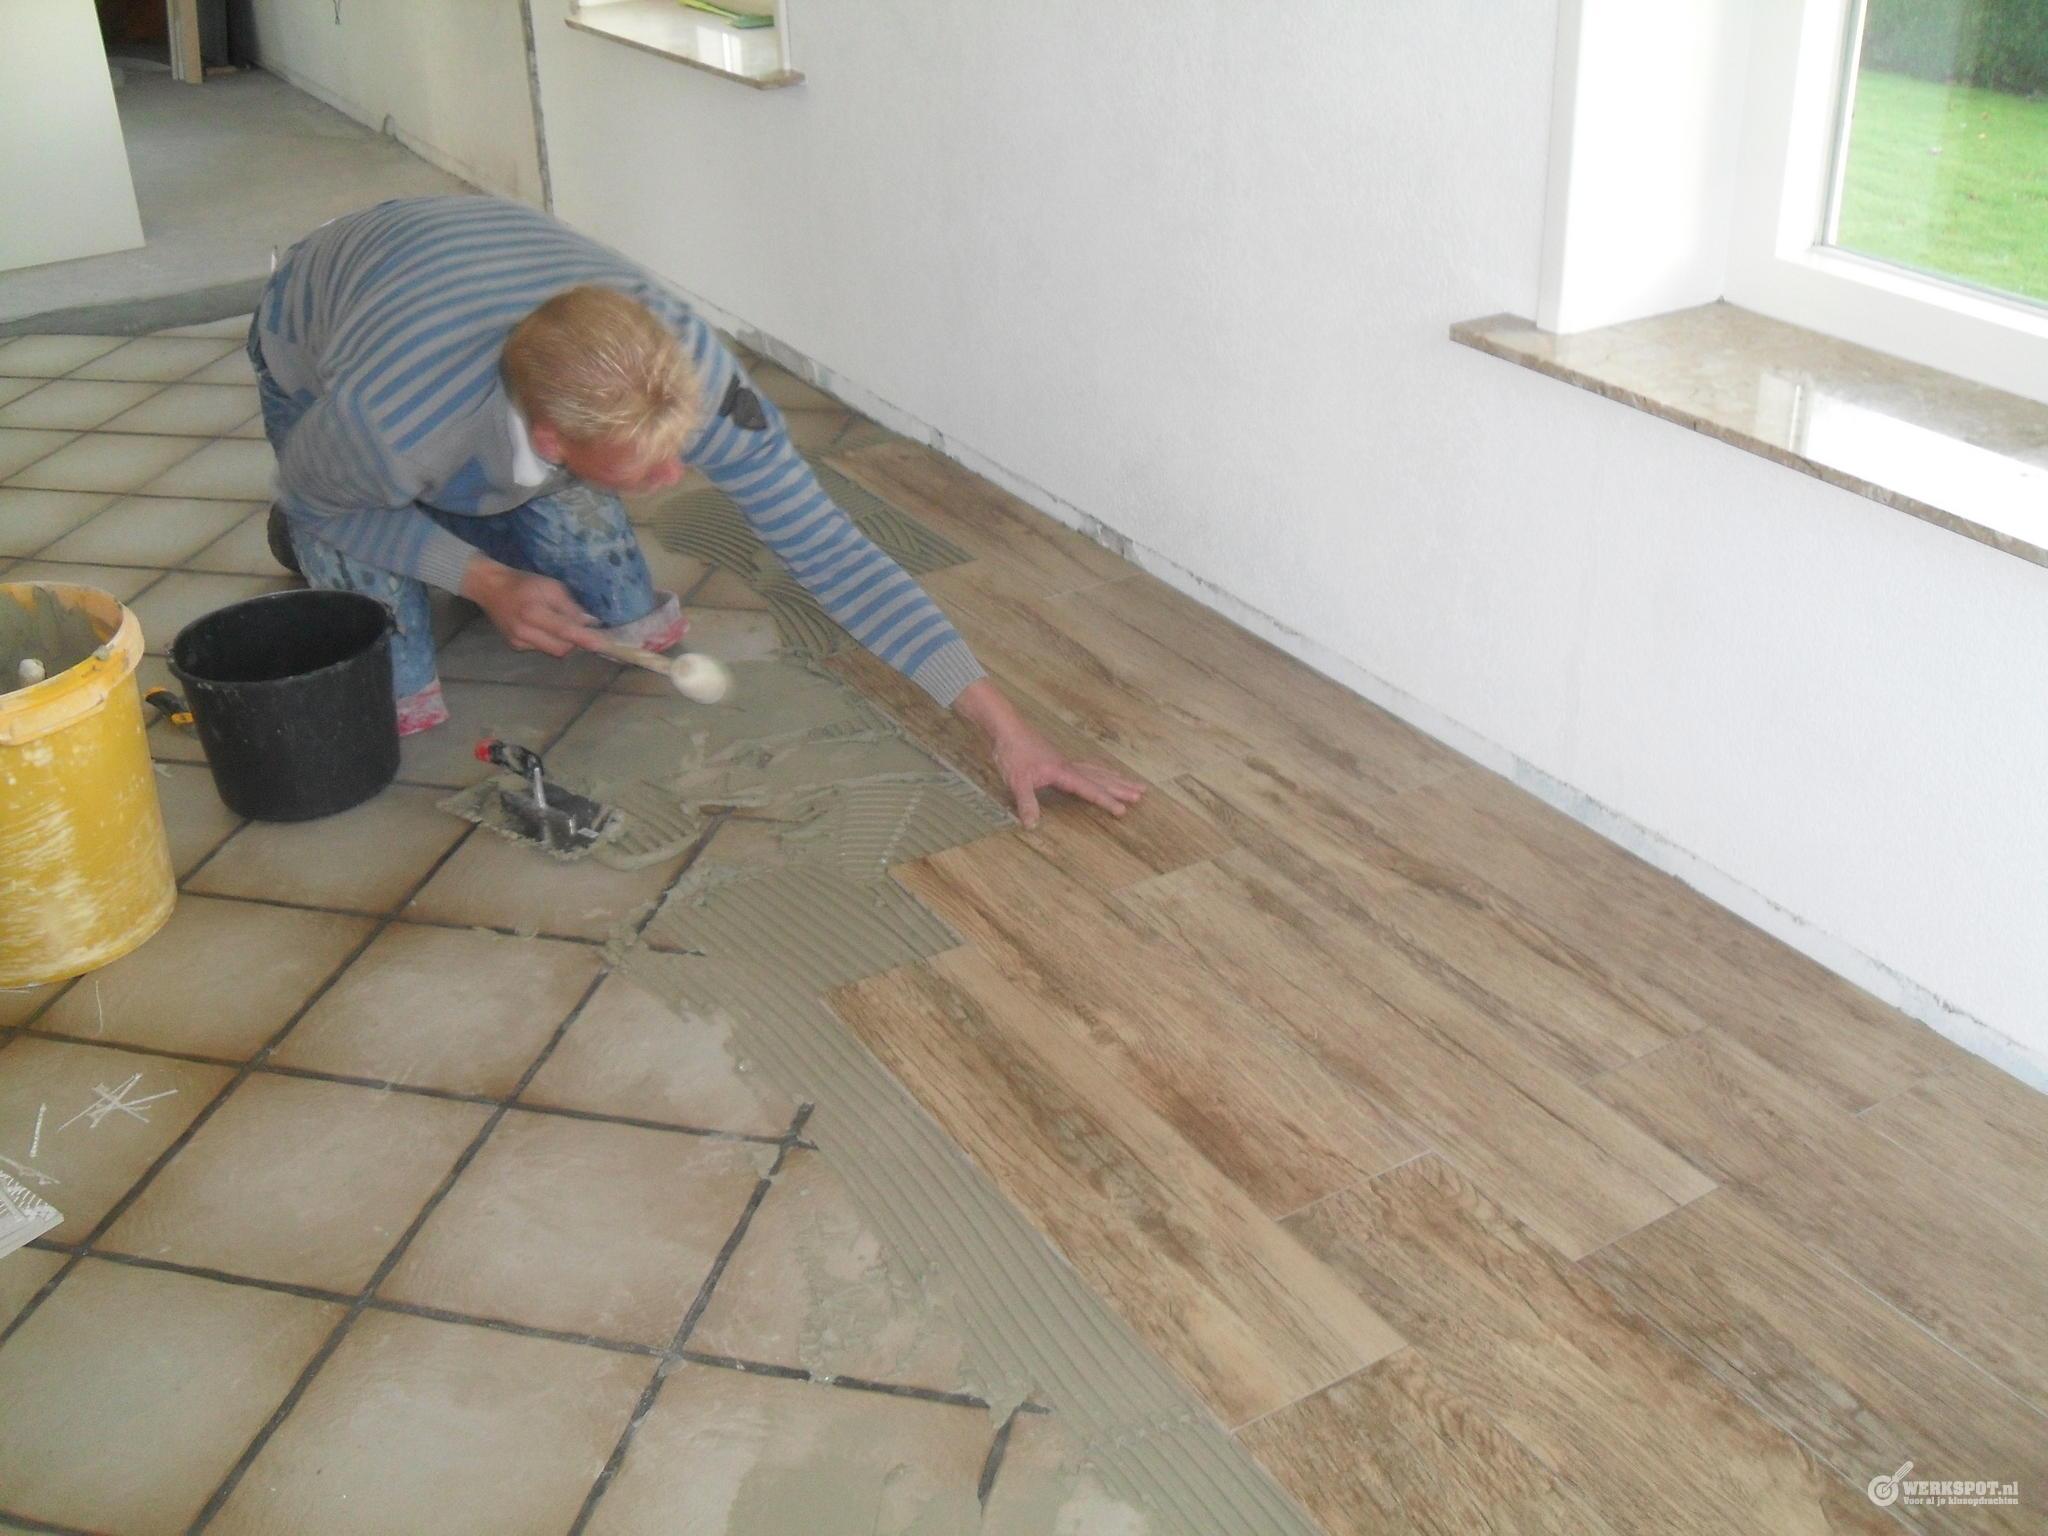 keuken wandtegels zonder voeg : Huiskamer En Keuken Vloertegels En Plinten Zetten Werkspot